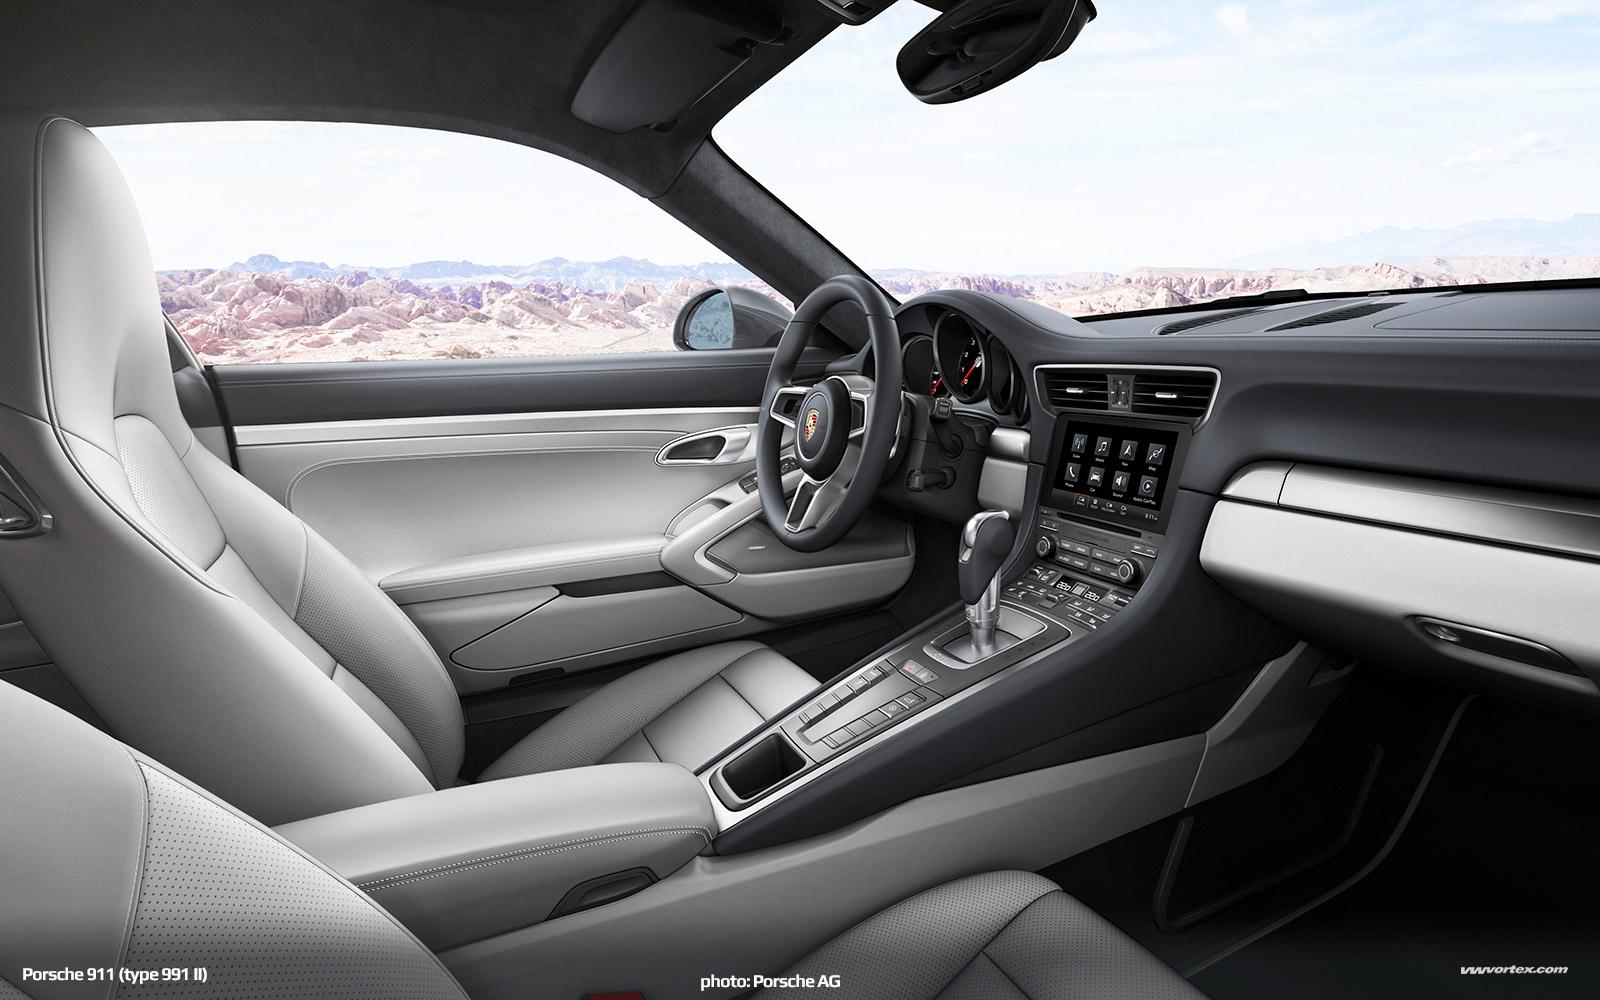 Porsche-911-991-ii-2016-507